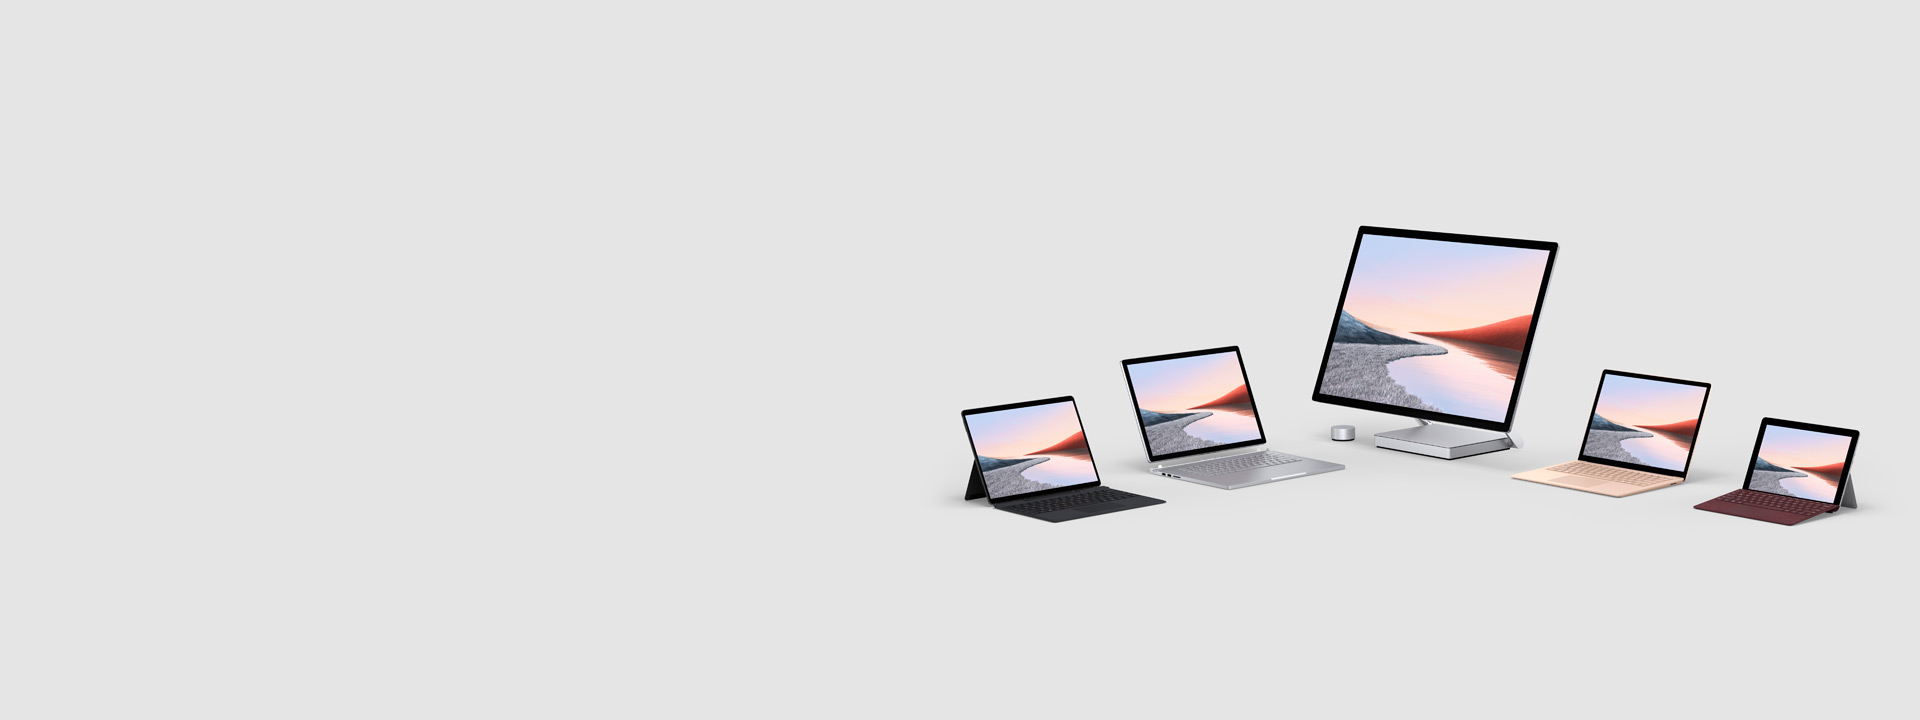 Surface 的几台电脑包括 Surface Pro 7、Surface Pro X 、Surface Book 2、Surface Studio 2 和 Surface Go